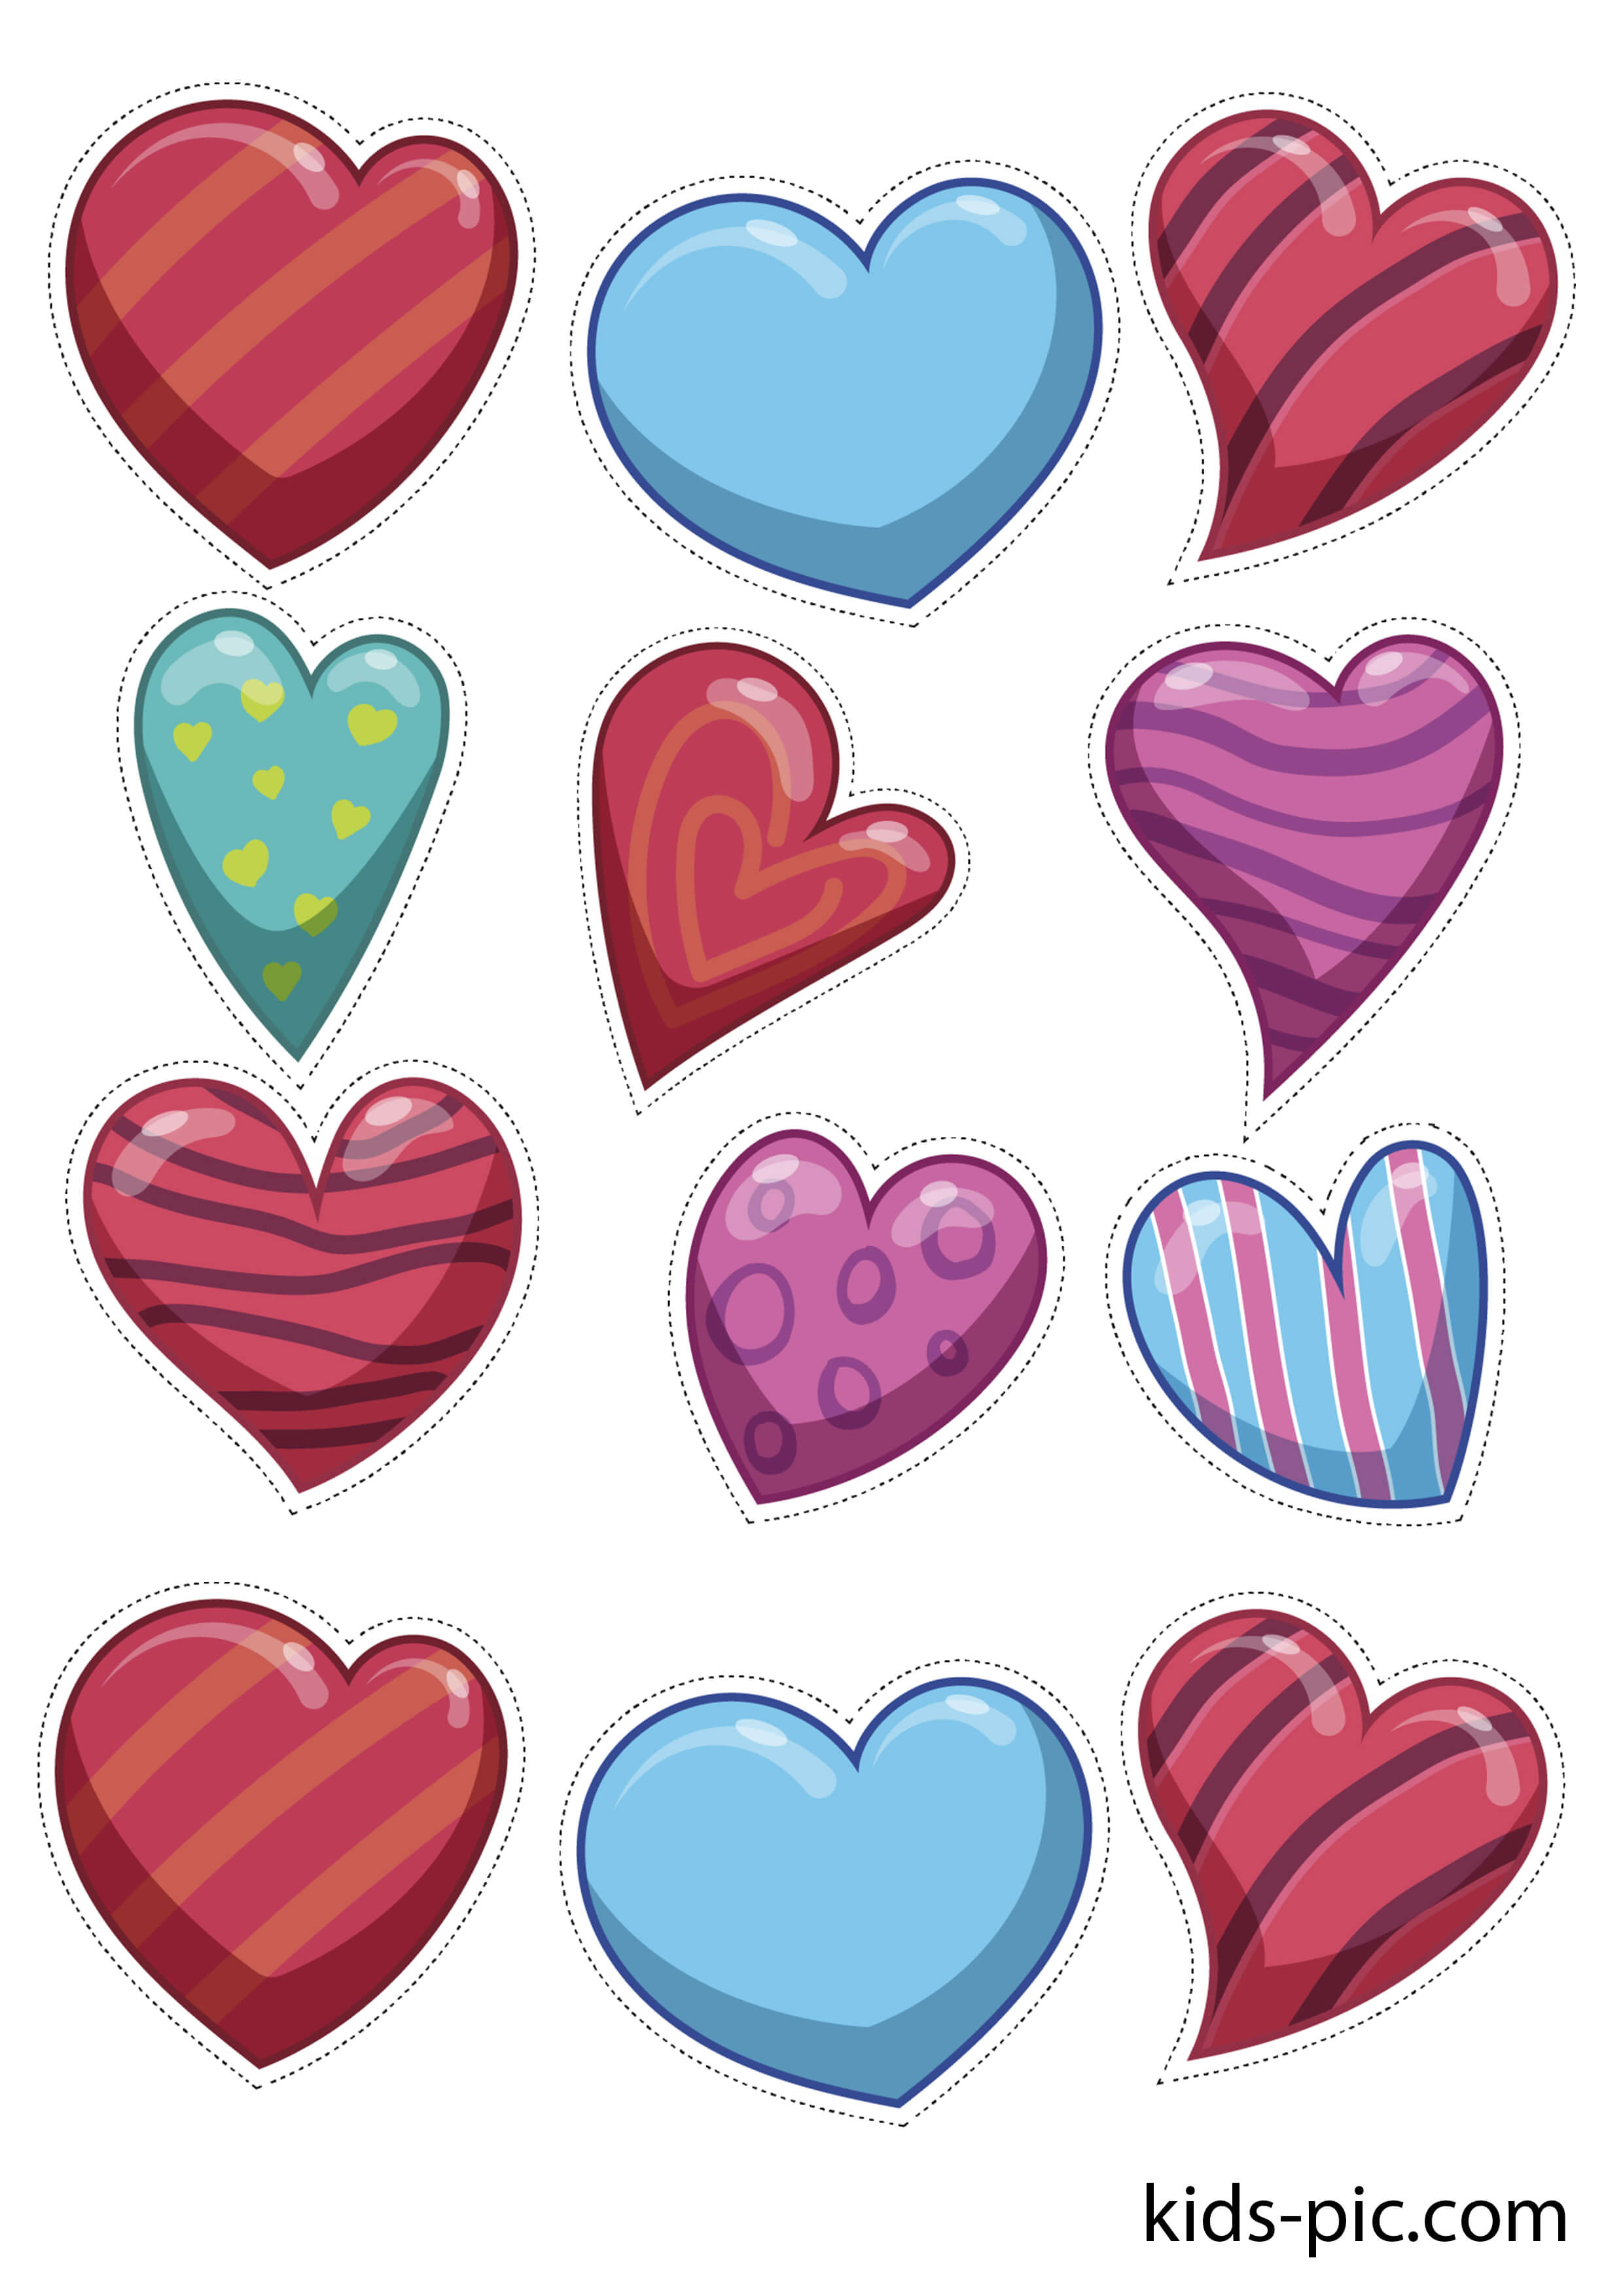 картинки образцы сердечек